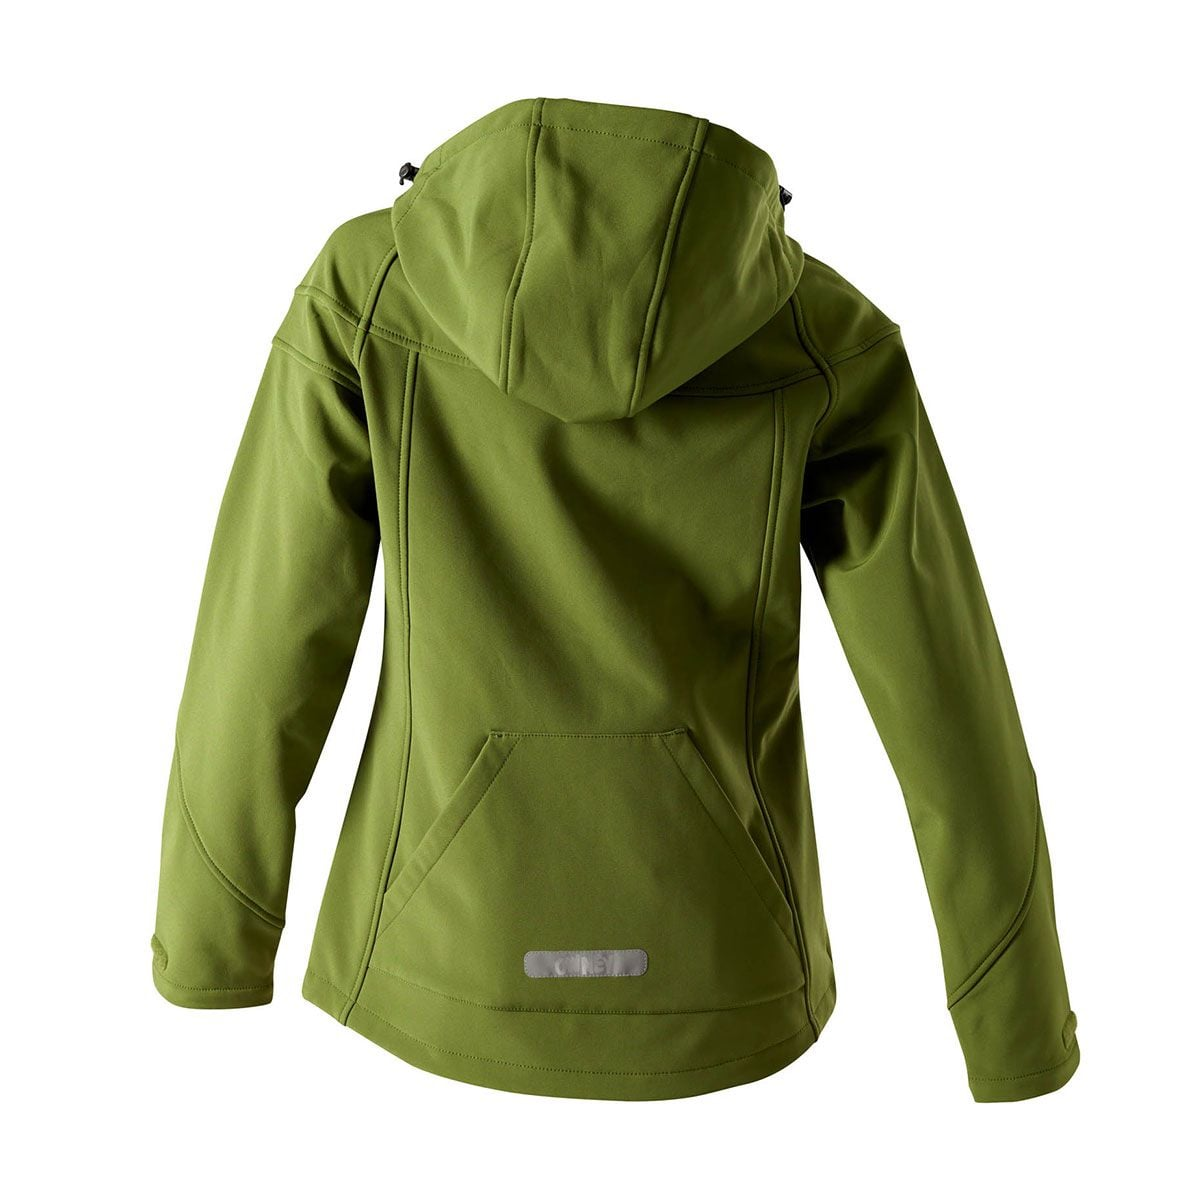 d53199609b262 Owney Cerro Damen Softshell Jacke cedar green günstig kaufen bei ...